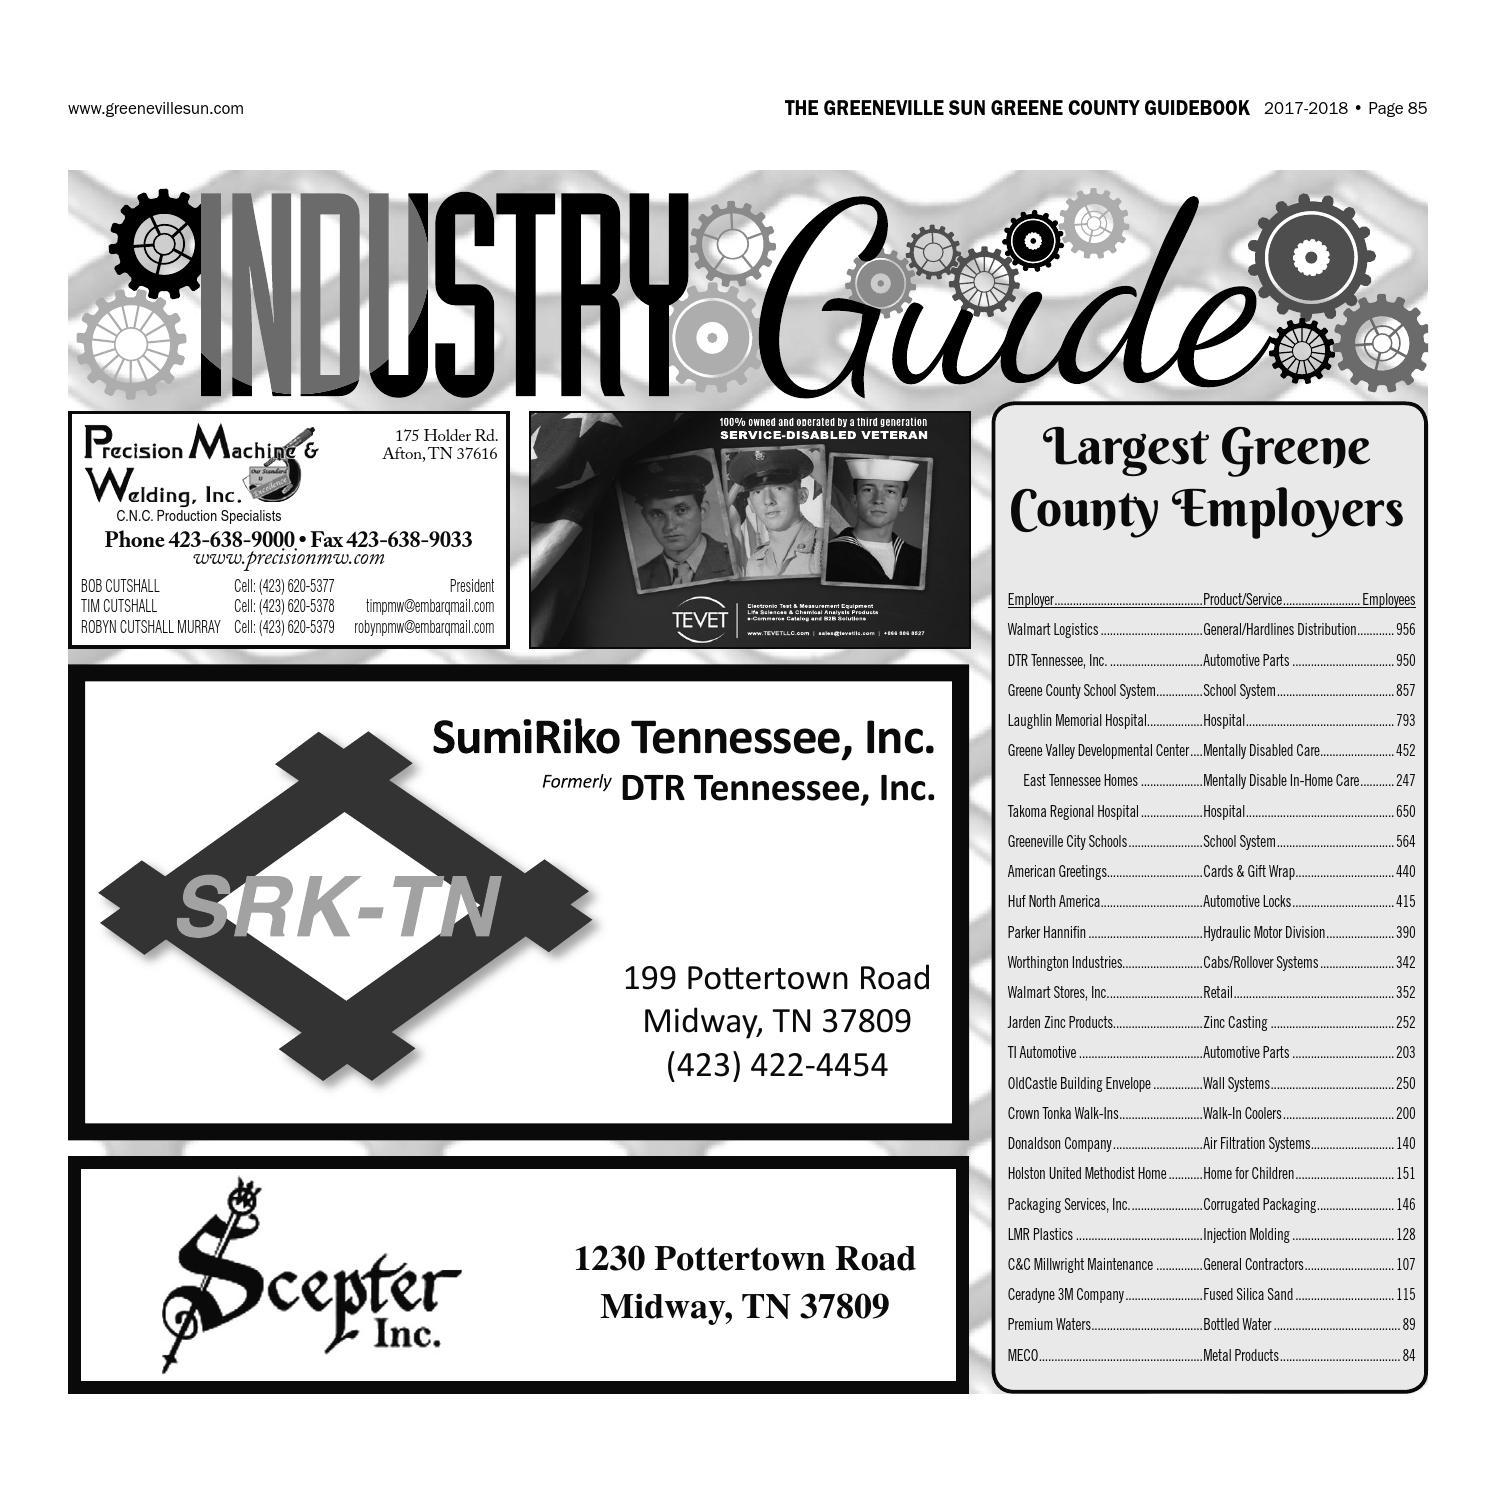 The greeneville sun guidebook 2017 18 by the greeneville sun issuu m4hsunfo